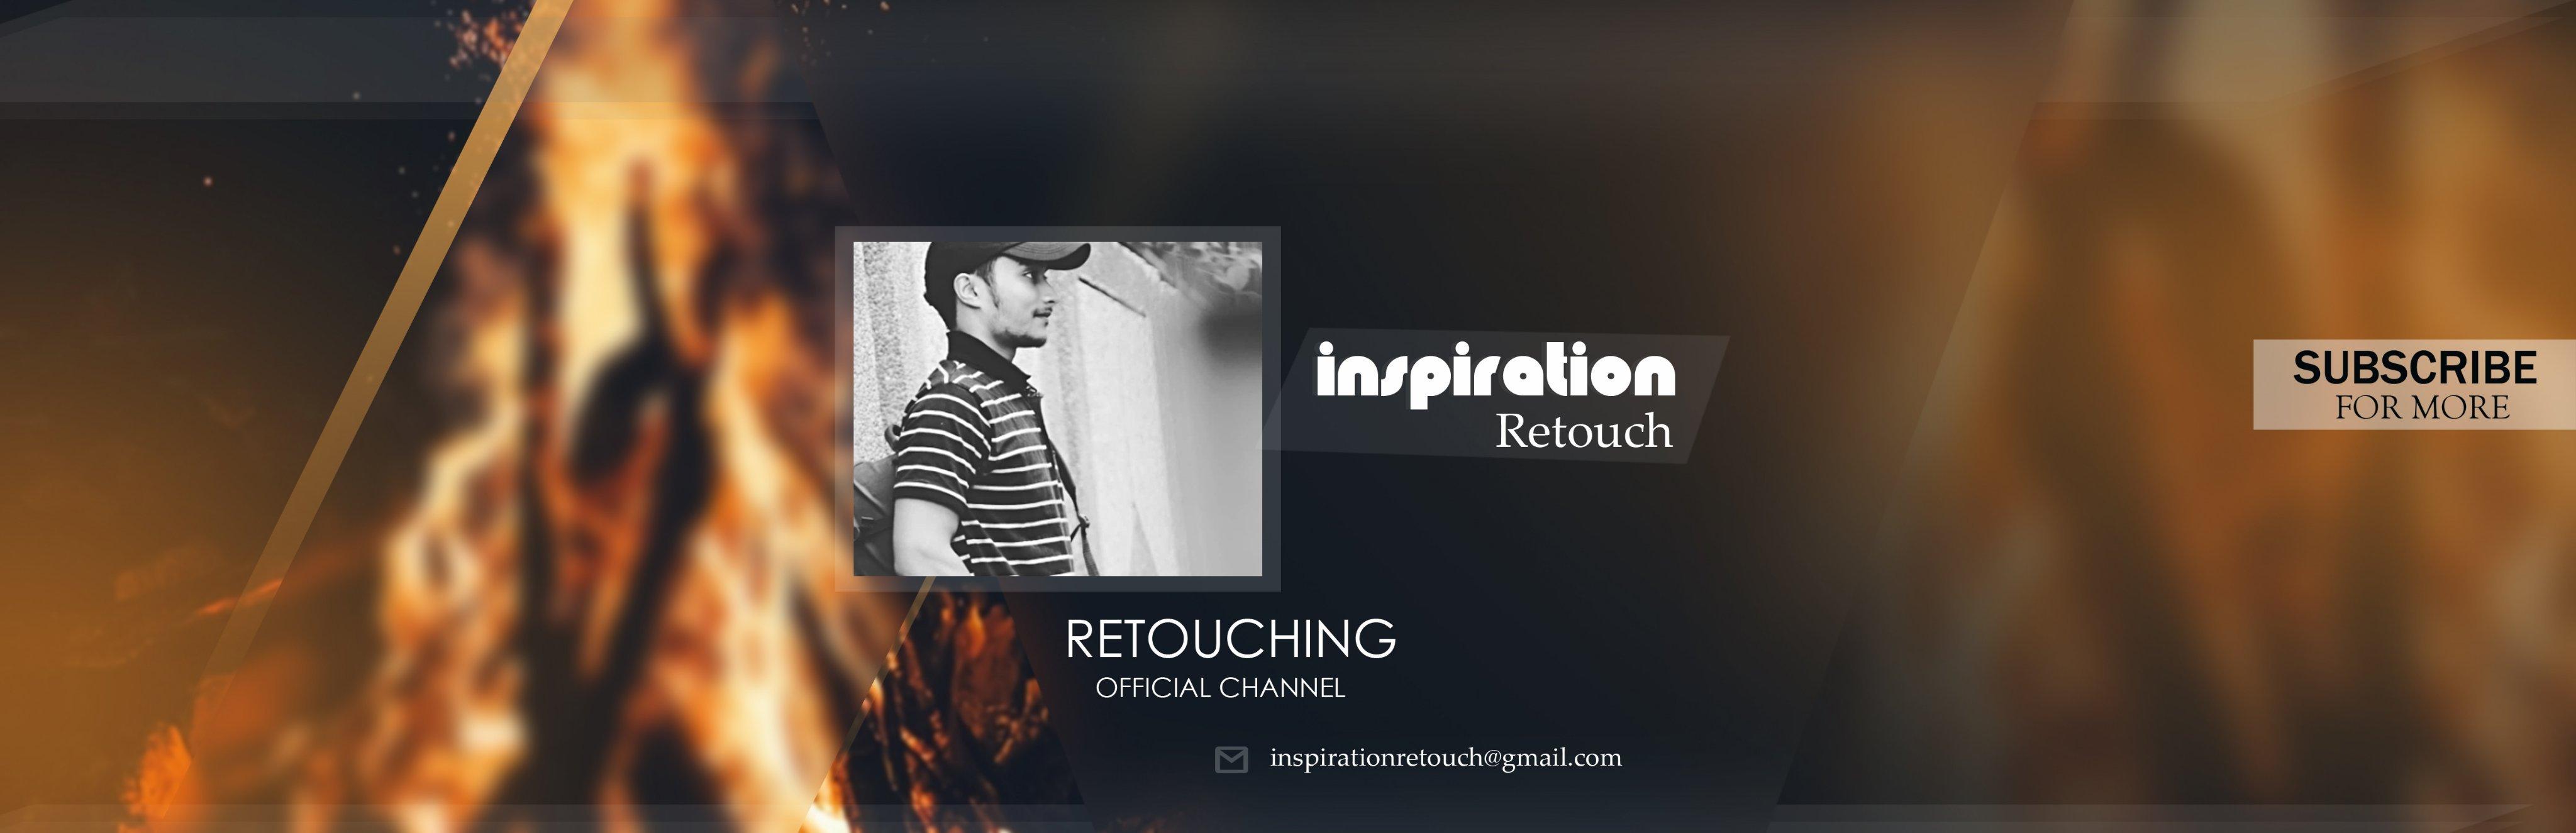 Inspiration Retouch